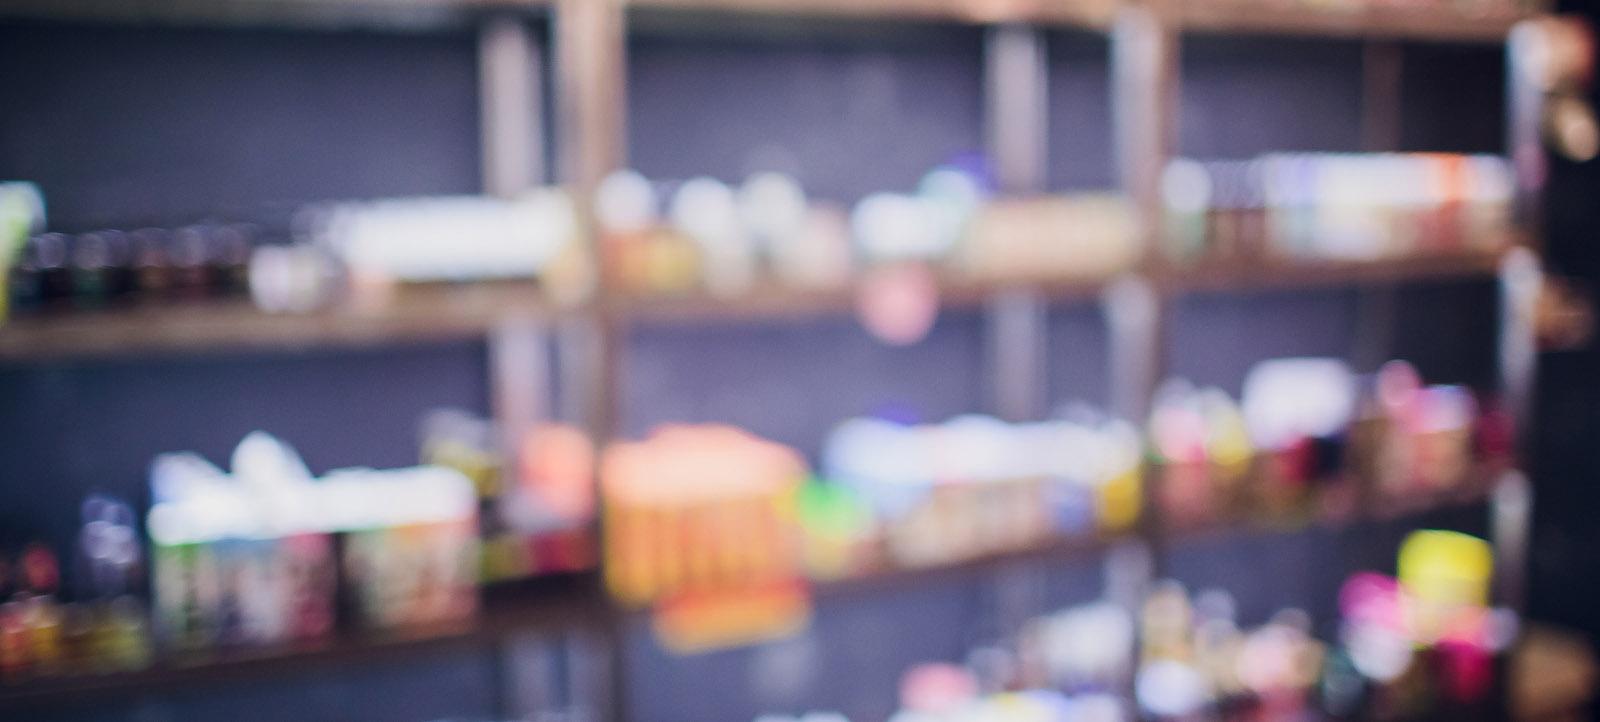 Best Vape Juice Brands To Buy in 2019 - E Liquid Wholesale USA